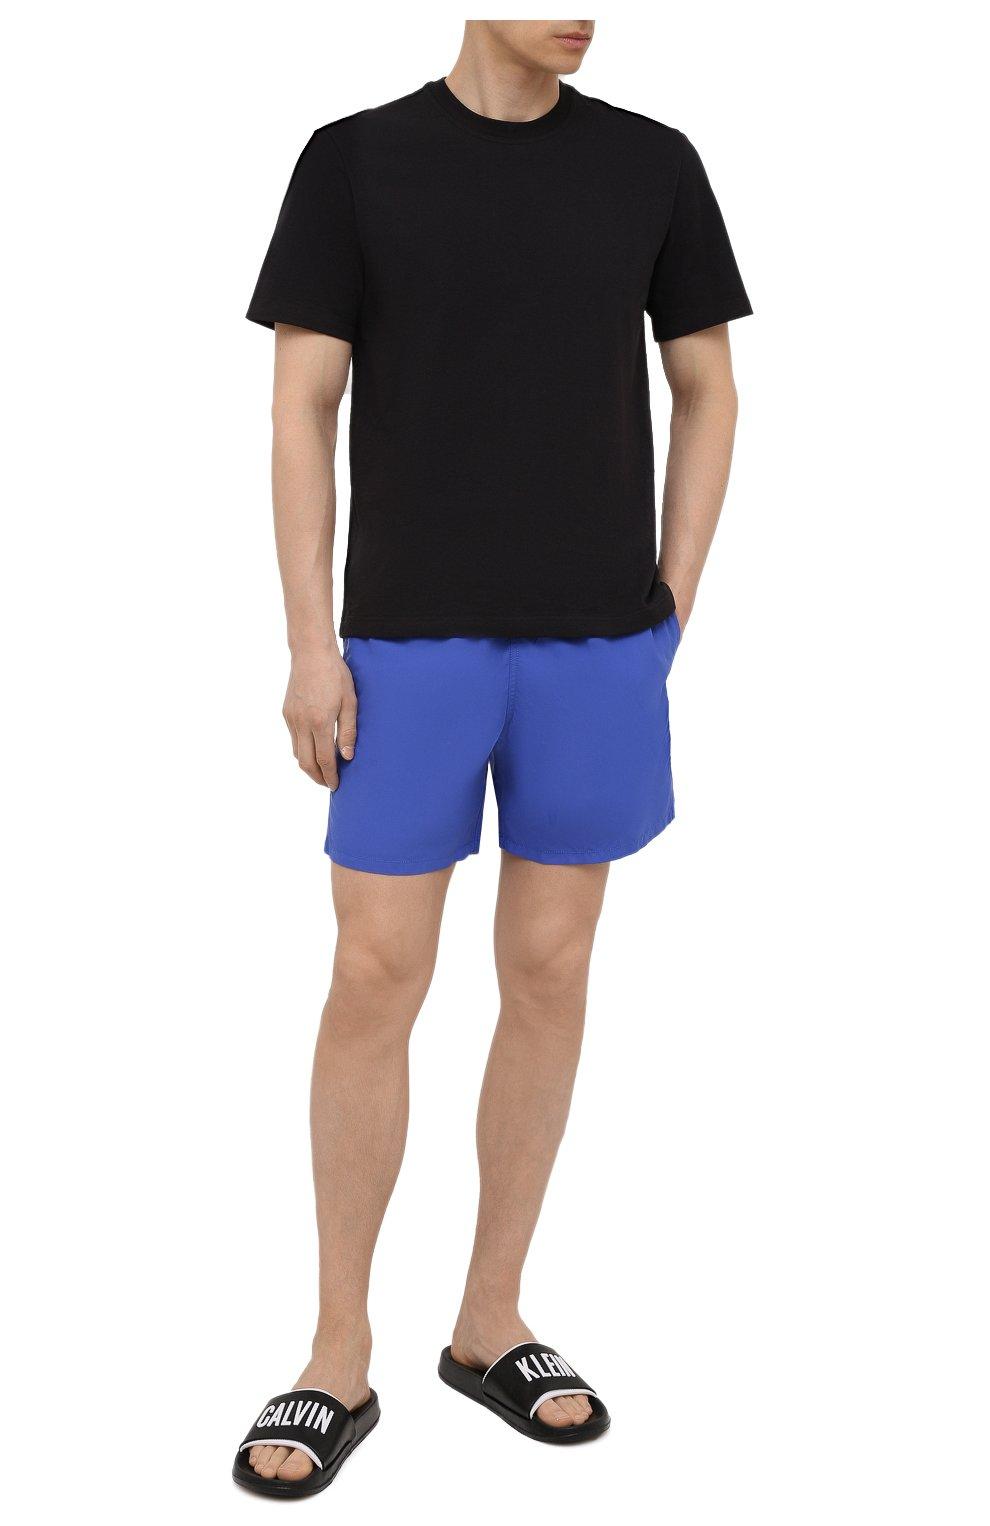 Мужские плавки-шорты VILEBREQUIN фиолетового цвета, арт. MOOC1A00/314 | Фото 2 (Принт: Без принта; Материал внешний: Синтетический материал)